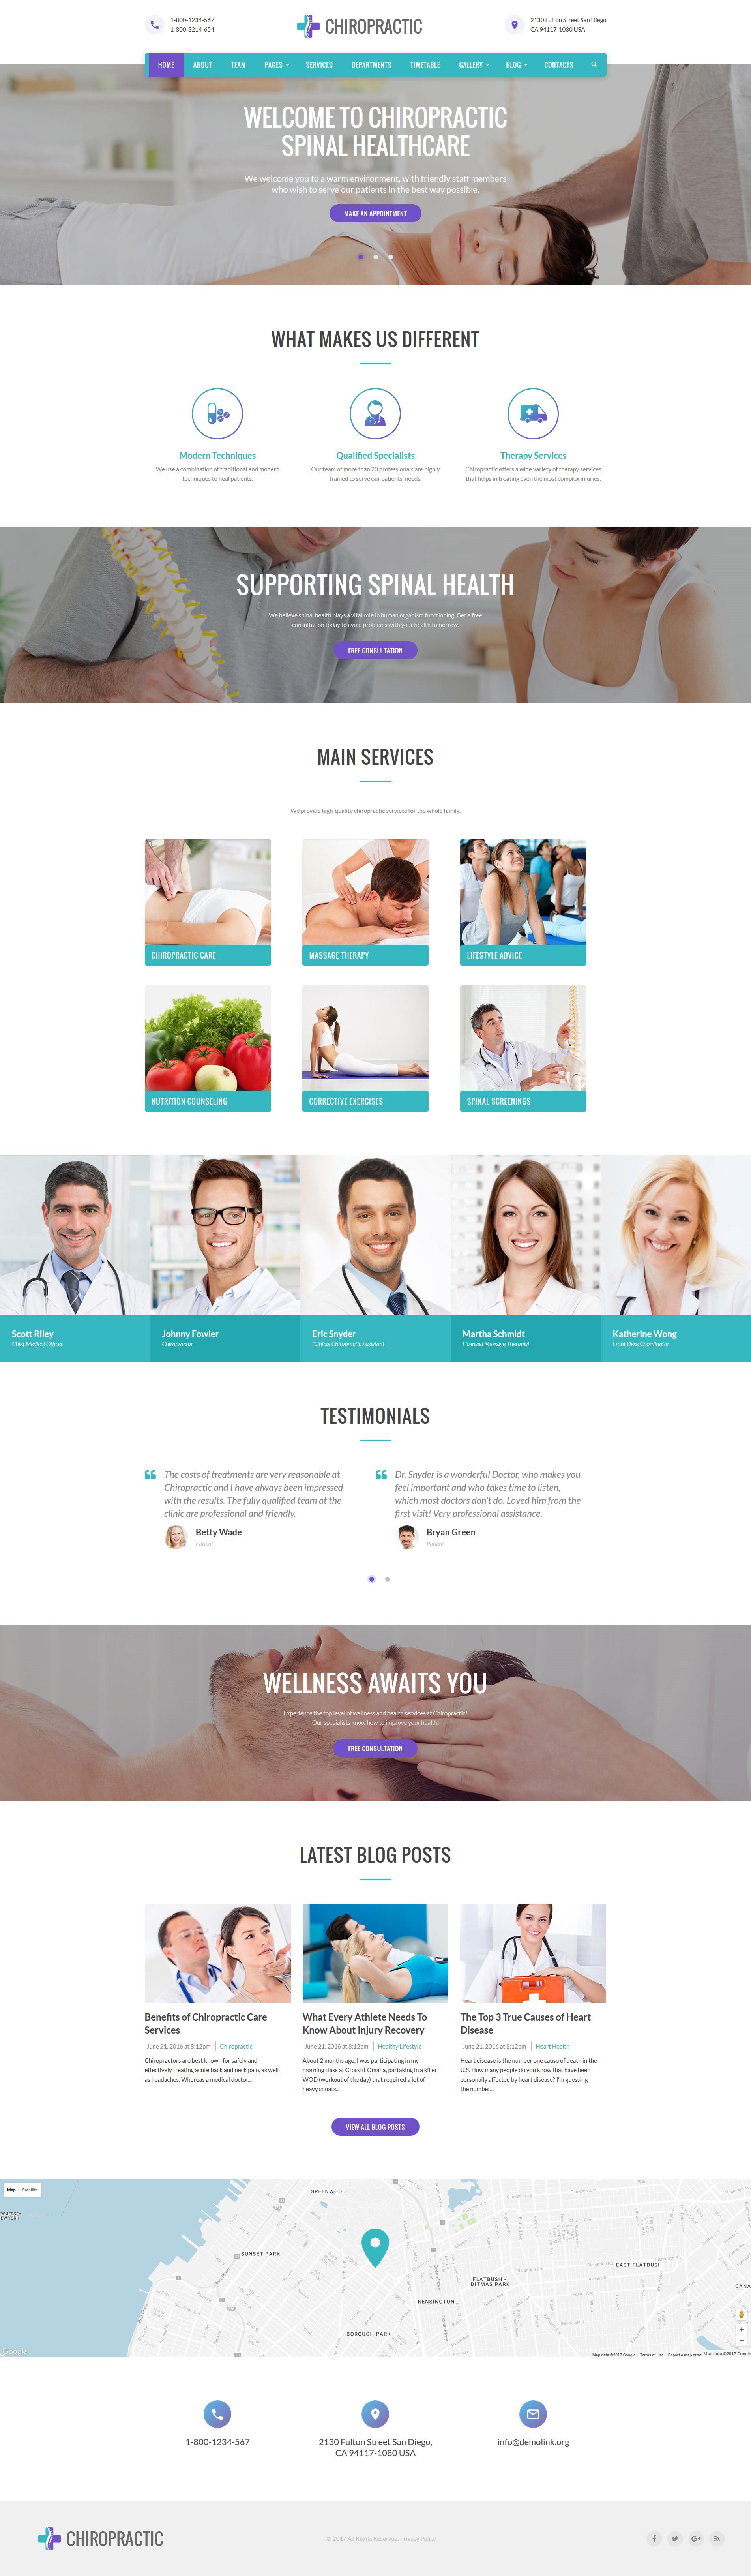 """Chiropractic - Alternative Medicine"" - адаптивний Шаблон сайту №61218"